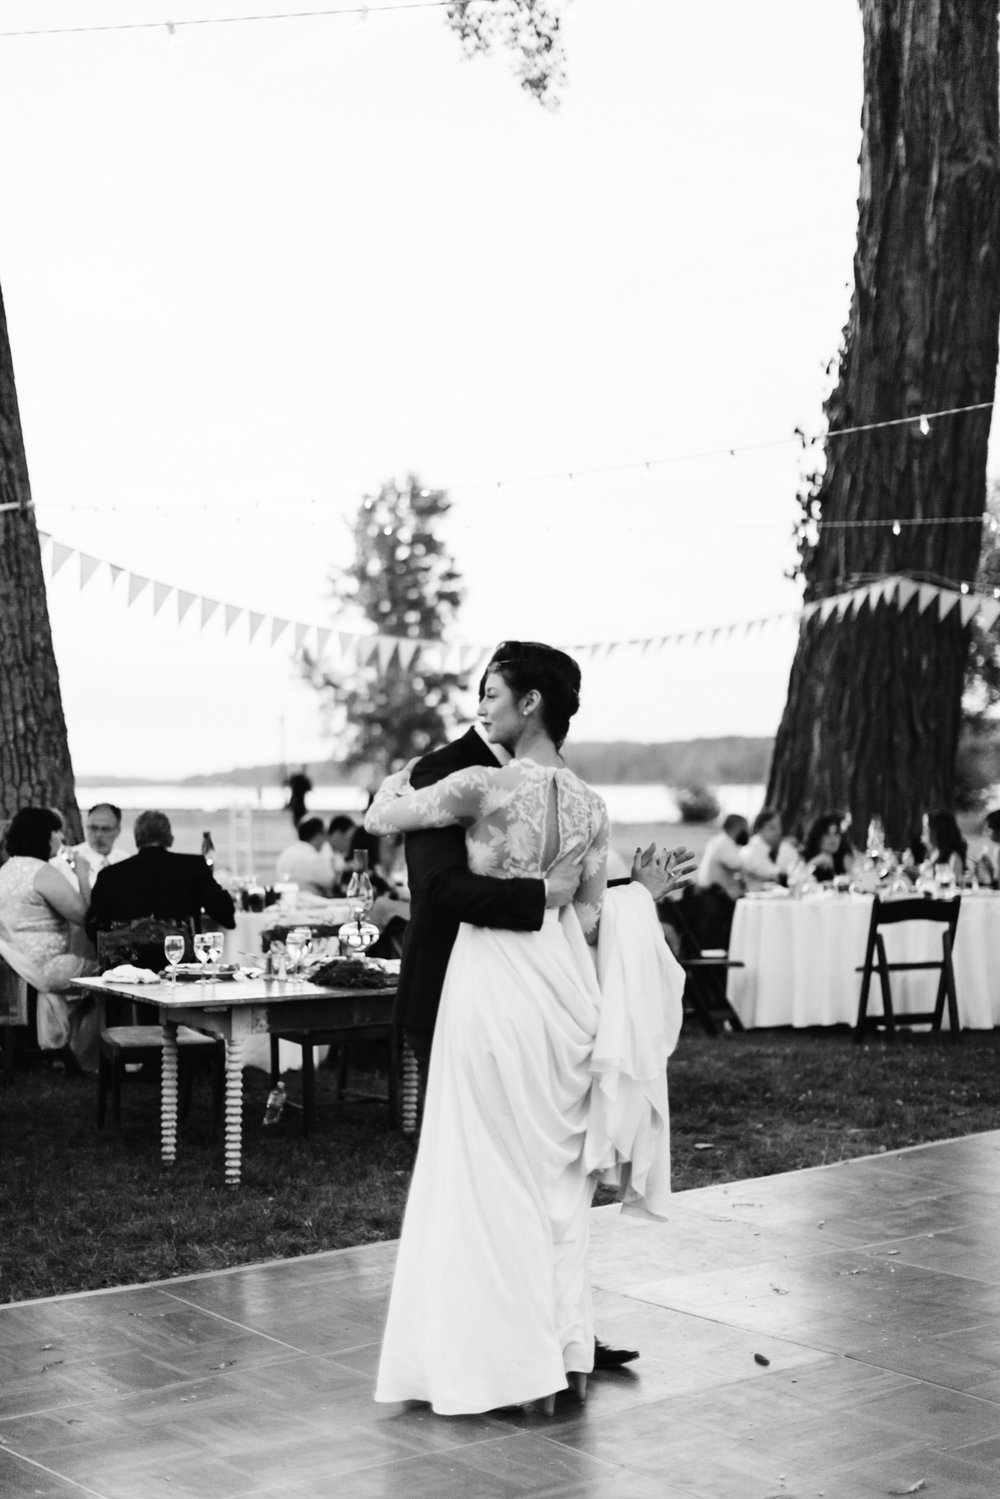 Kimberly-Coccagnia-Wedding-Photographer-257.JPG